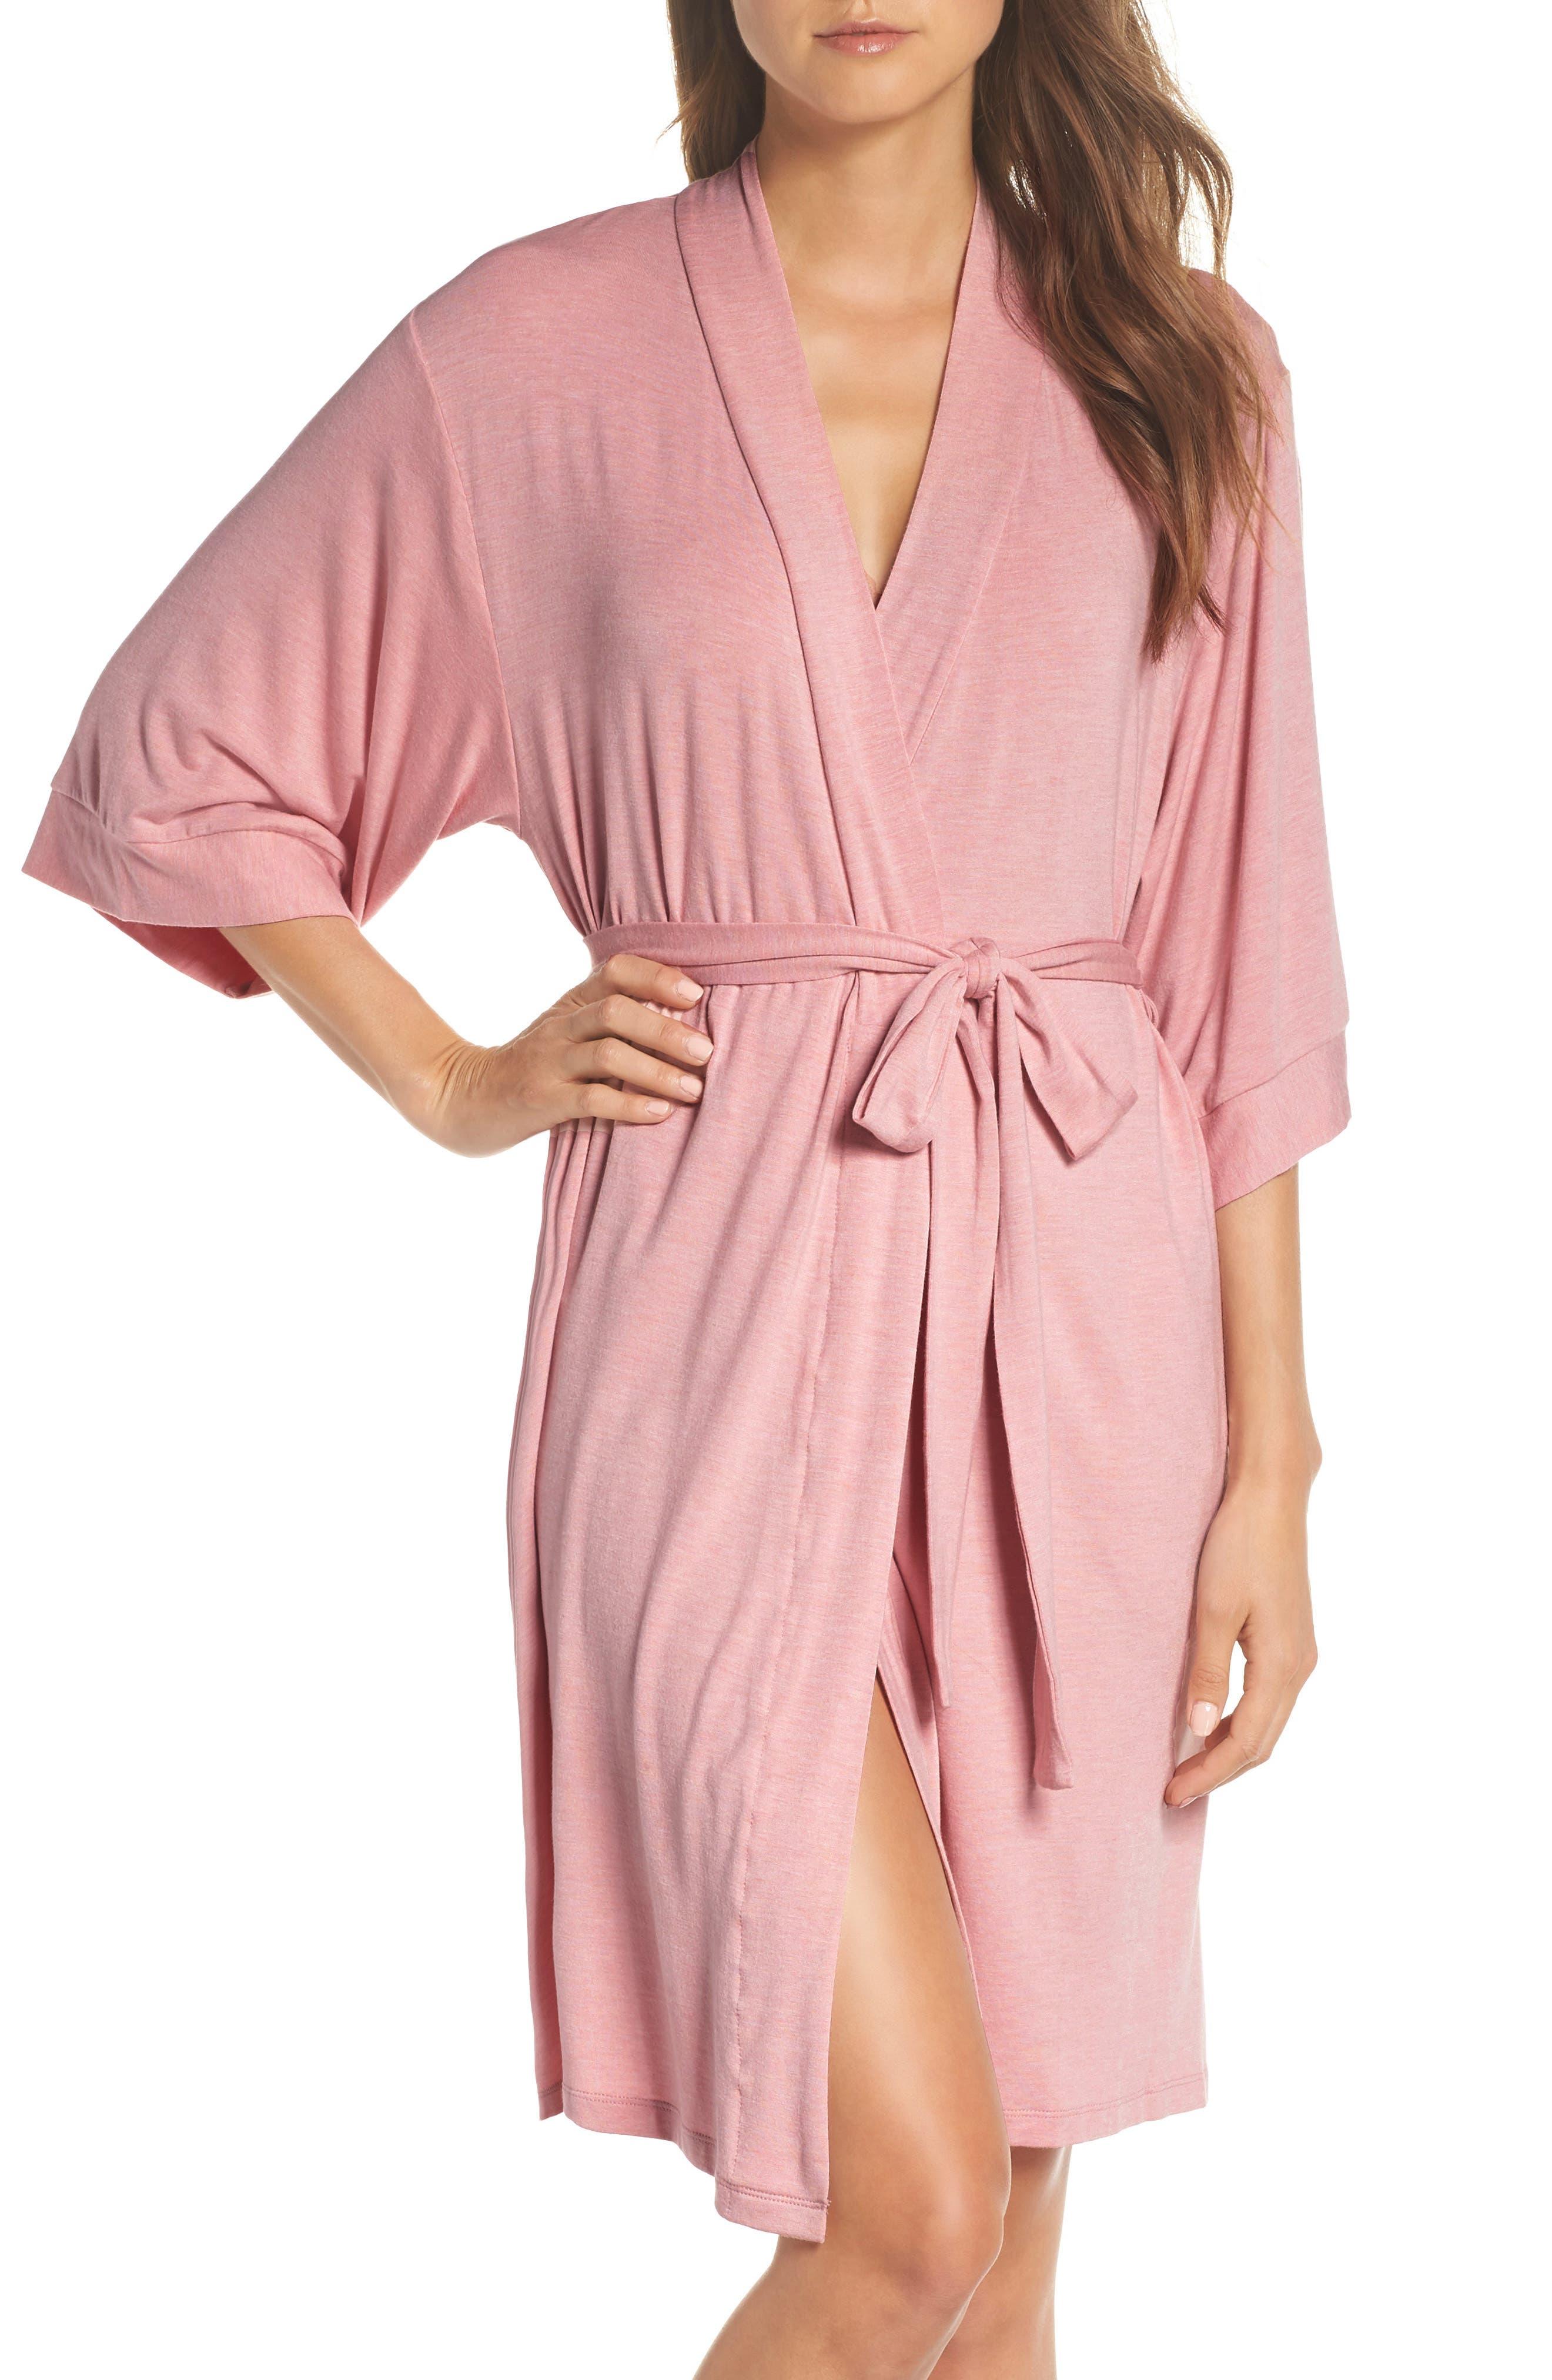 PAPINELLE Short Robe, Main, color, VINTAGE PINK